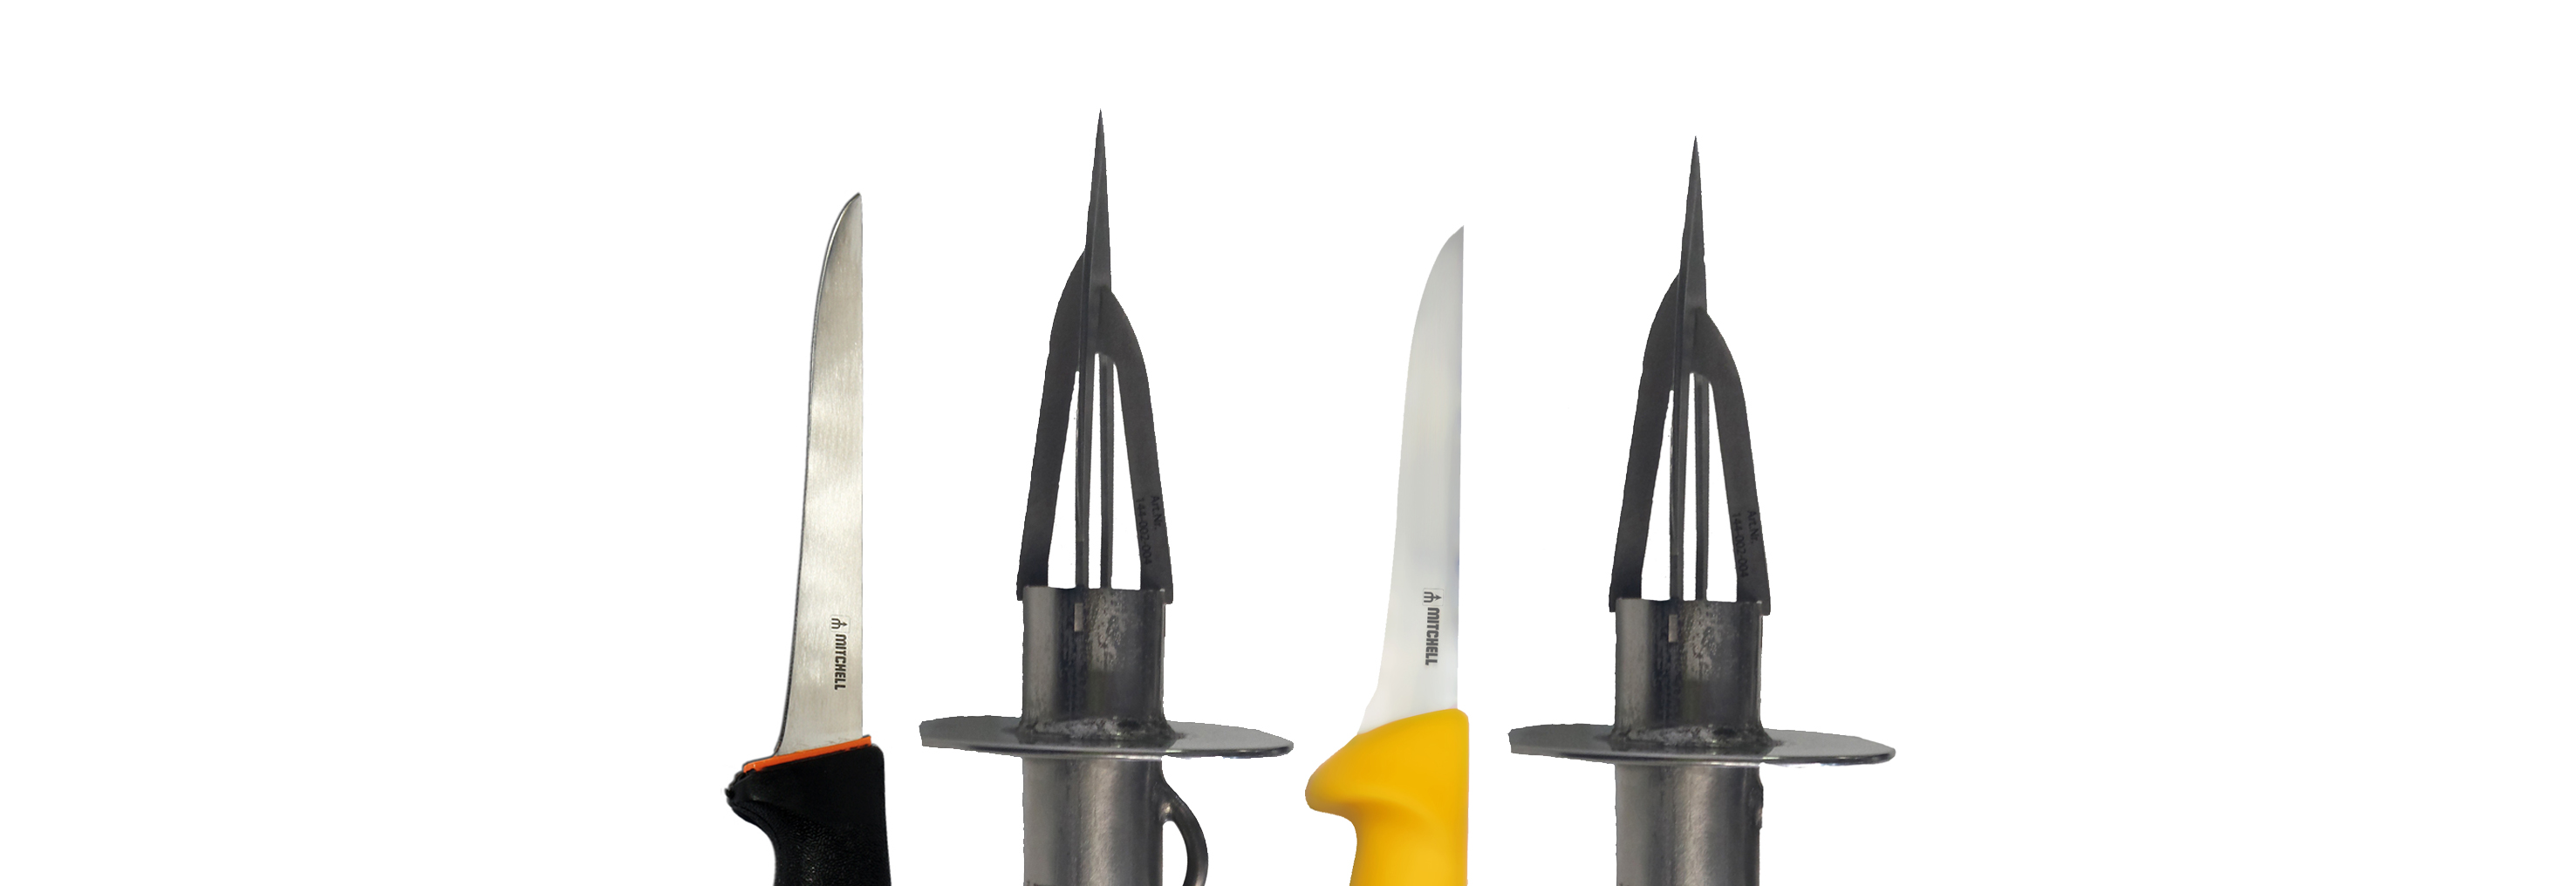 sticking-knifes2.jpg